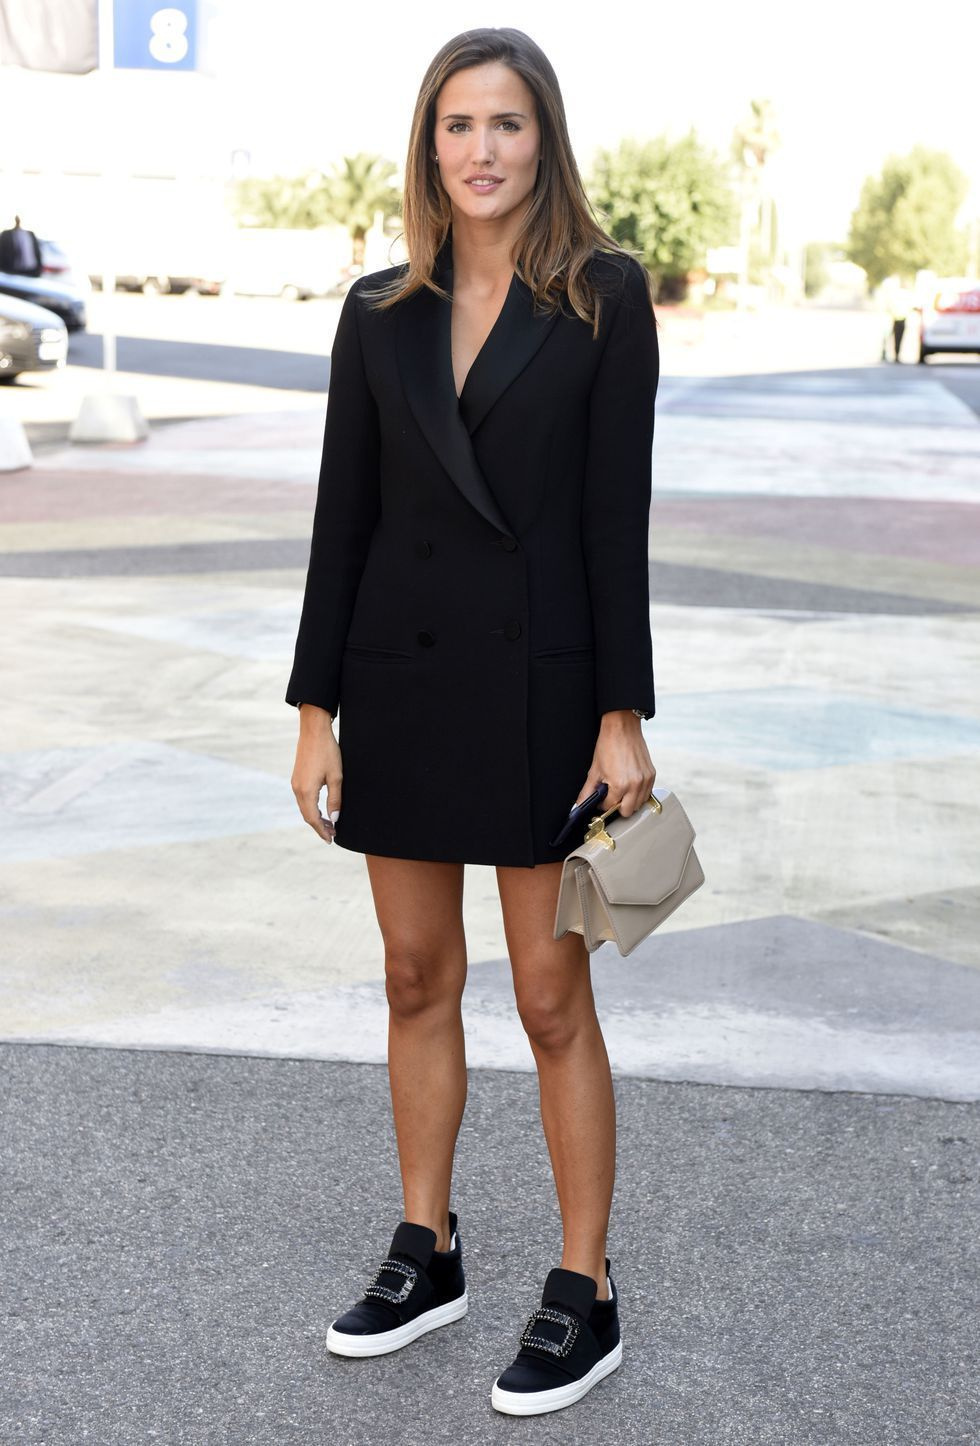 a38bc206ff2 La instagramer española Alex Riviere magistral con blazer tipo esmoquin a  modo de vestido